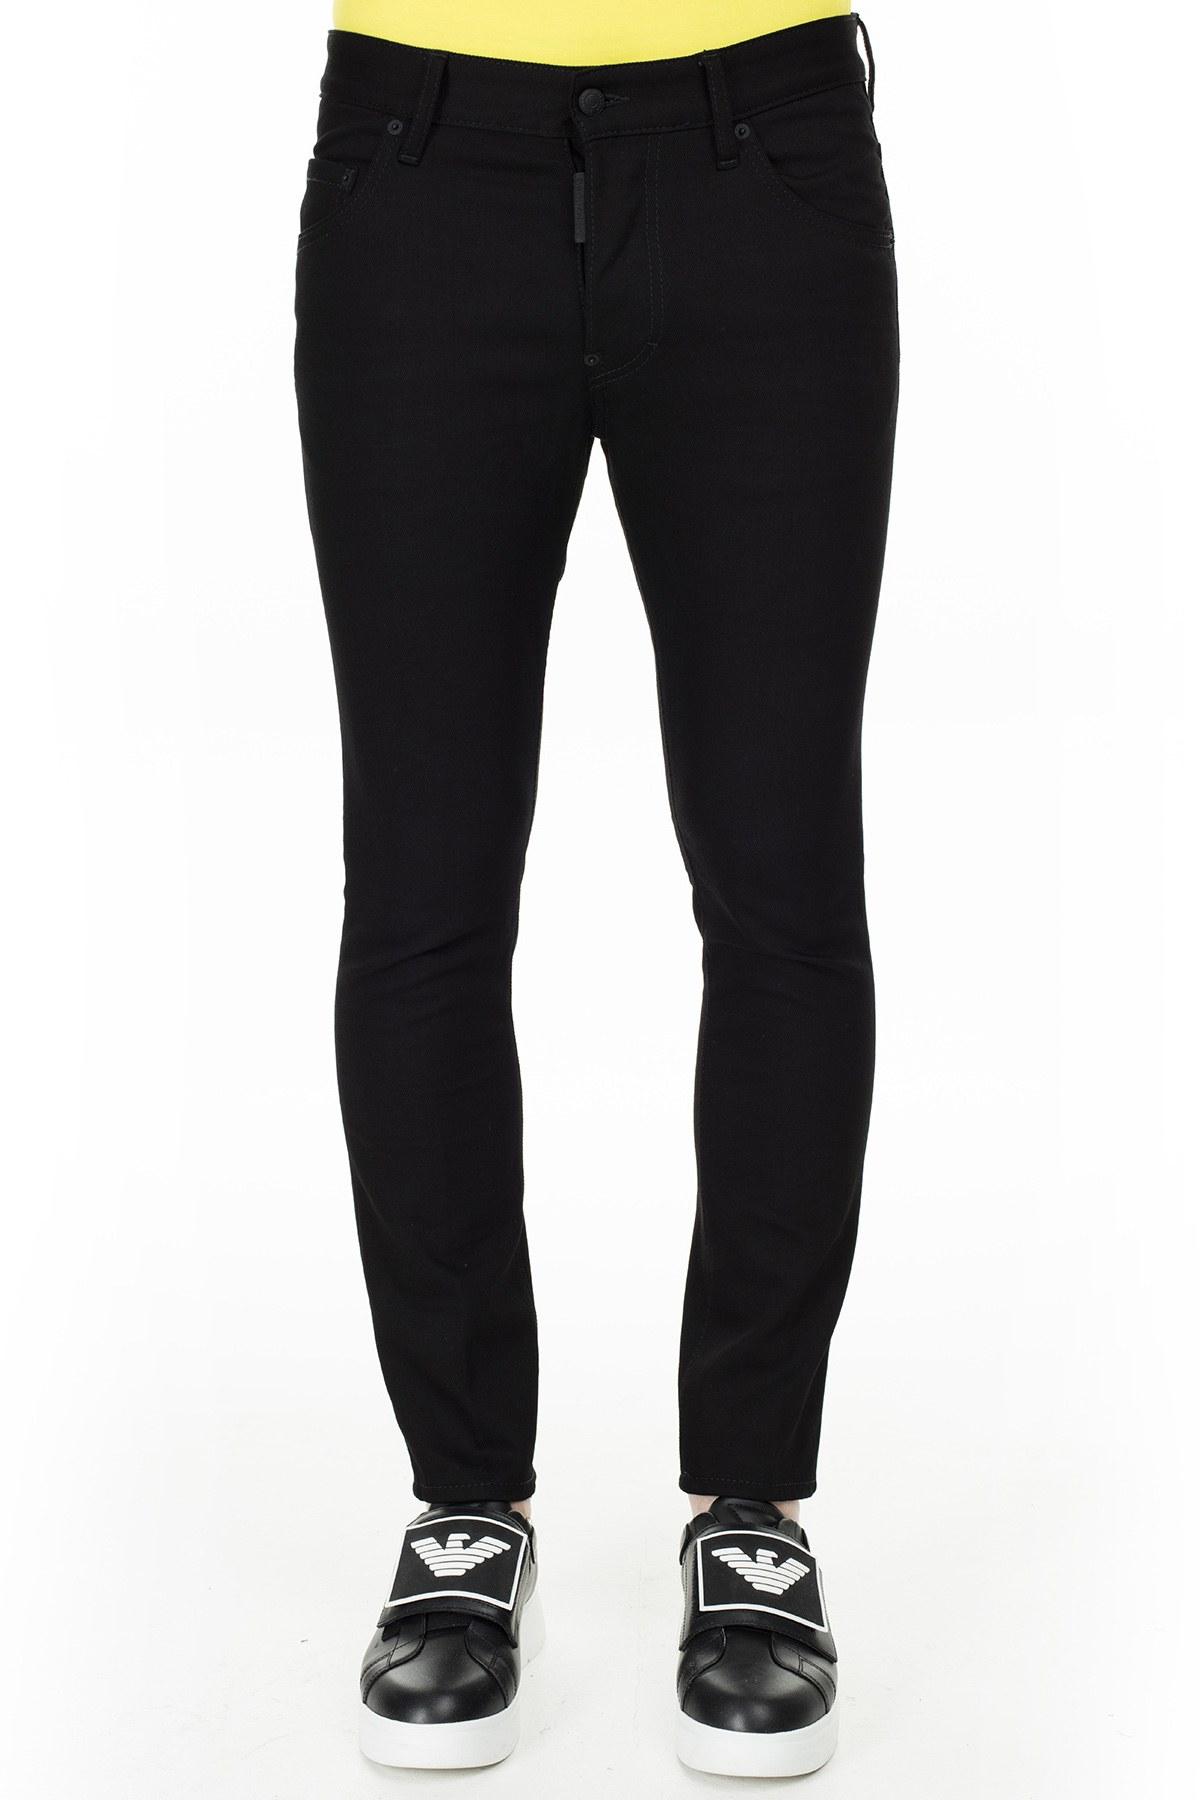 Dsquared2 Jeans Erkek Kot Pantolon S74LB0695 S30564 900 SİYAH